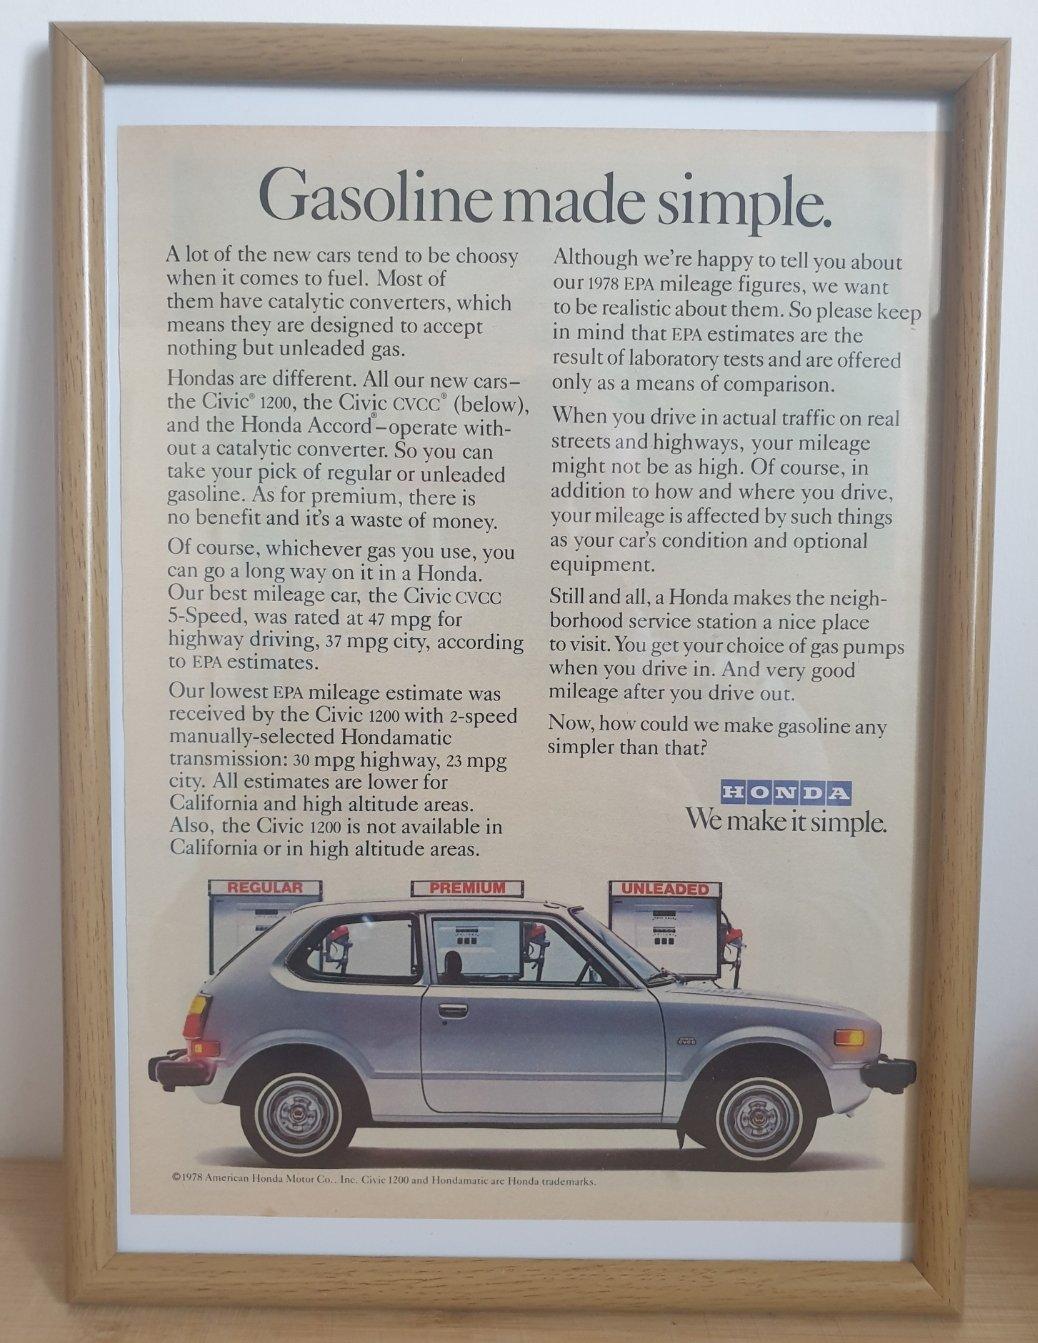 1968 Original 1978 Honda Civic Framed Advert For Sale (picture 1 of 3)